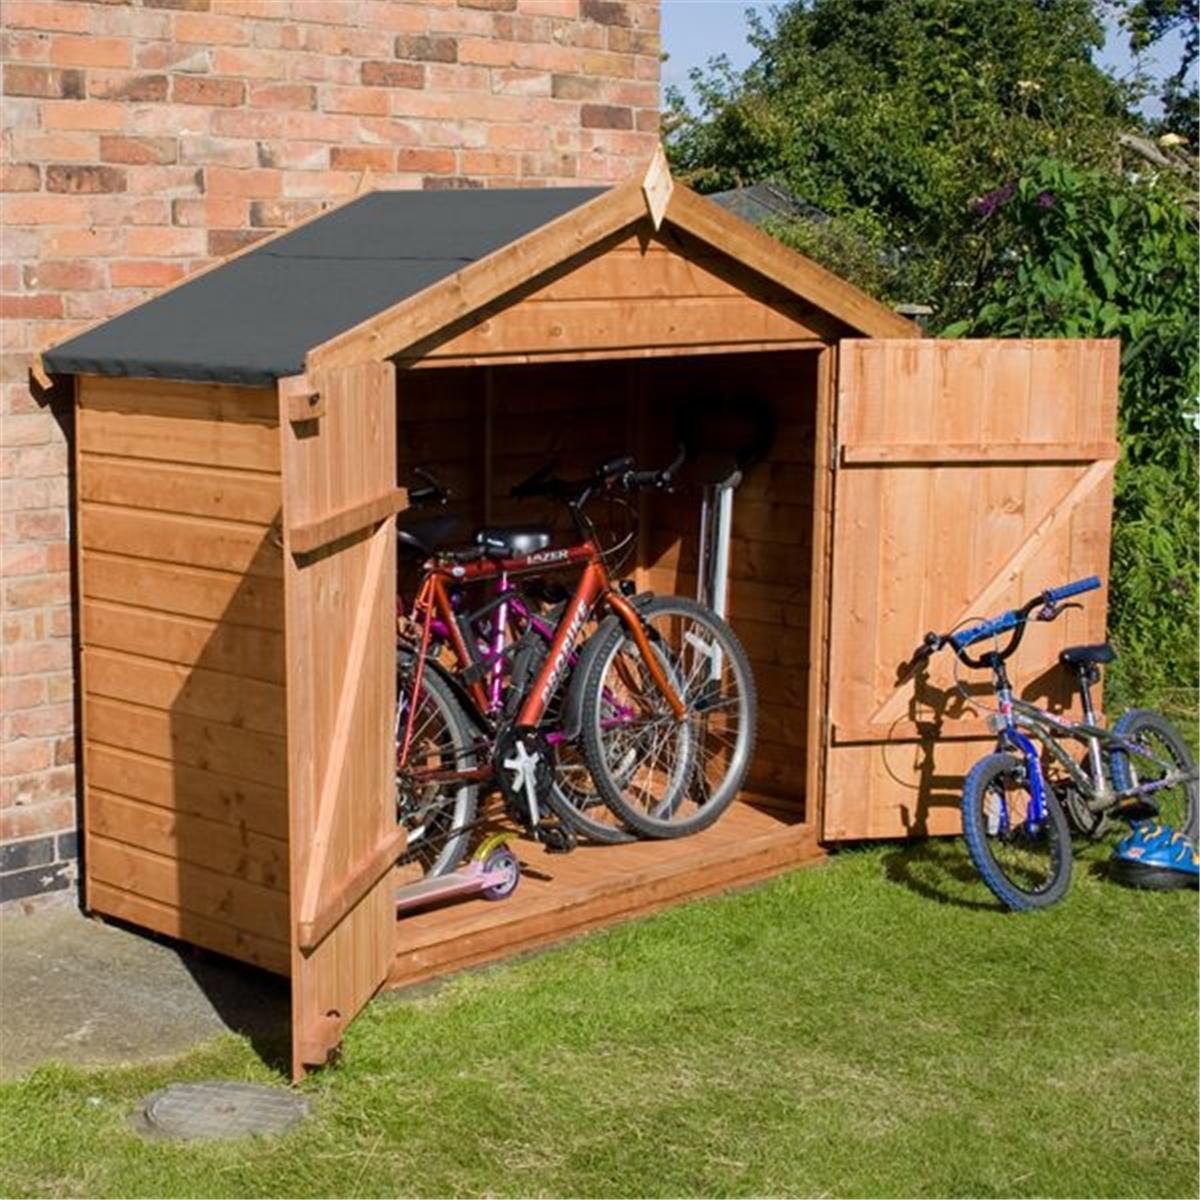 7 x 3 premier tongue and groove bike store 10mm solid osb. Black Bedroom Furniture Sets. Home Design Ideas